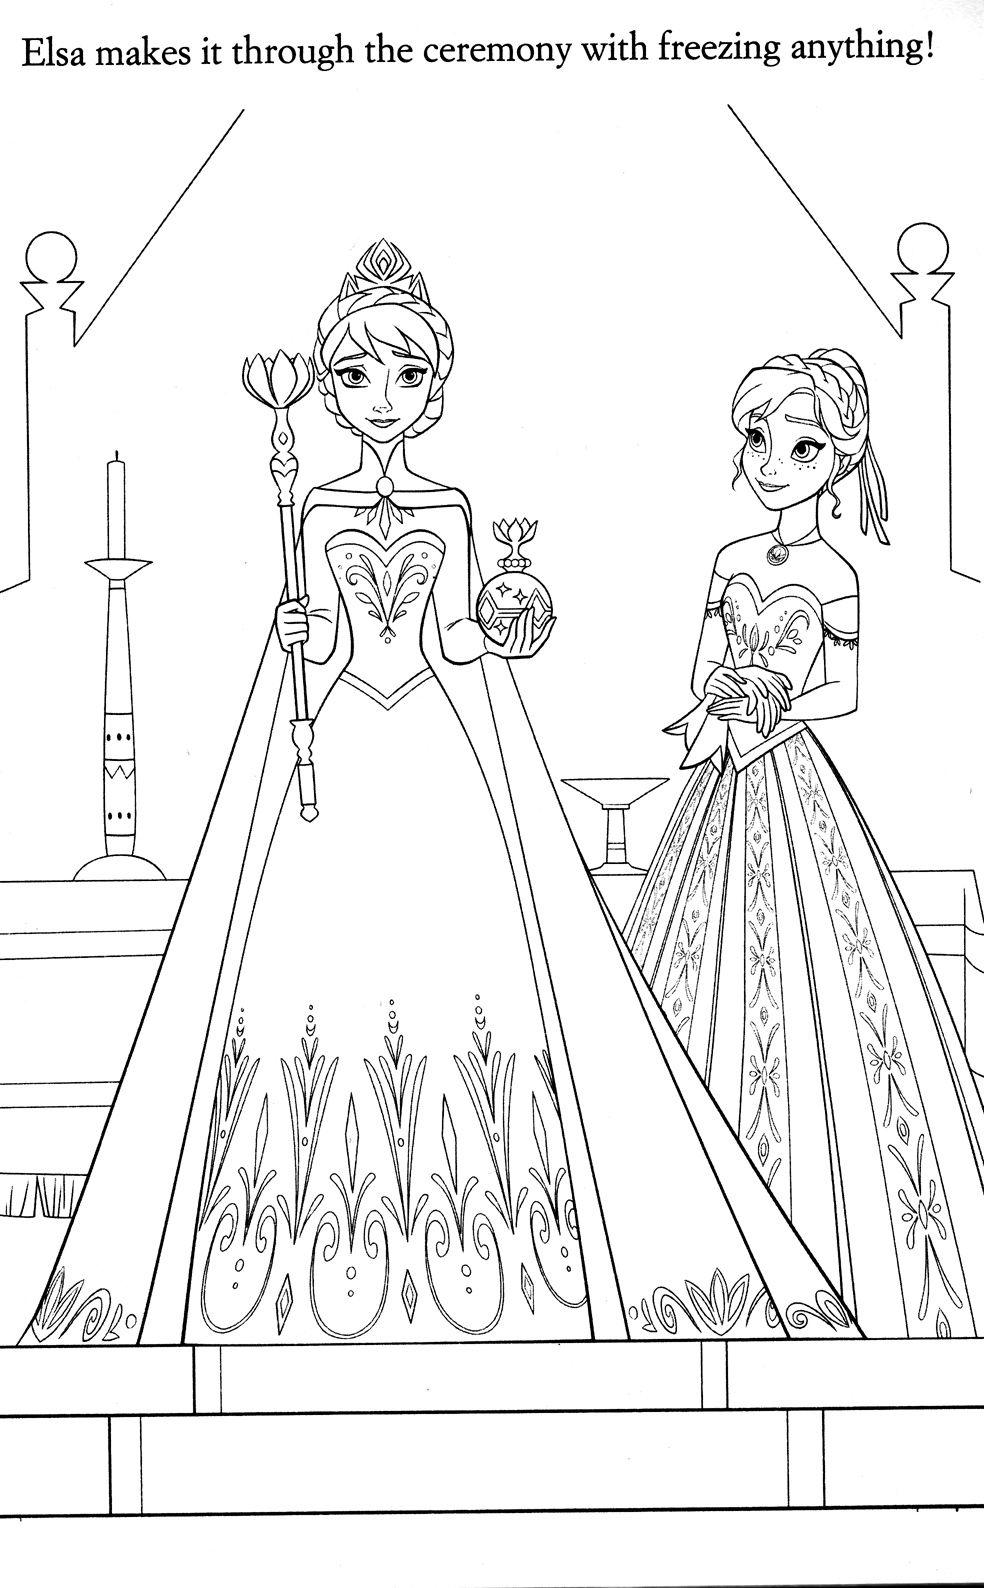 Disney Coloring Pages | Coloring Pages * Disney | Pinterest | Frozen ...